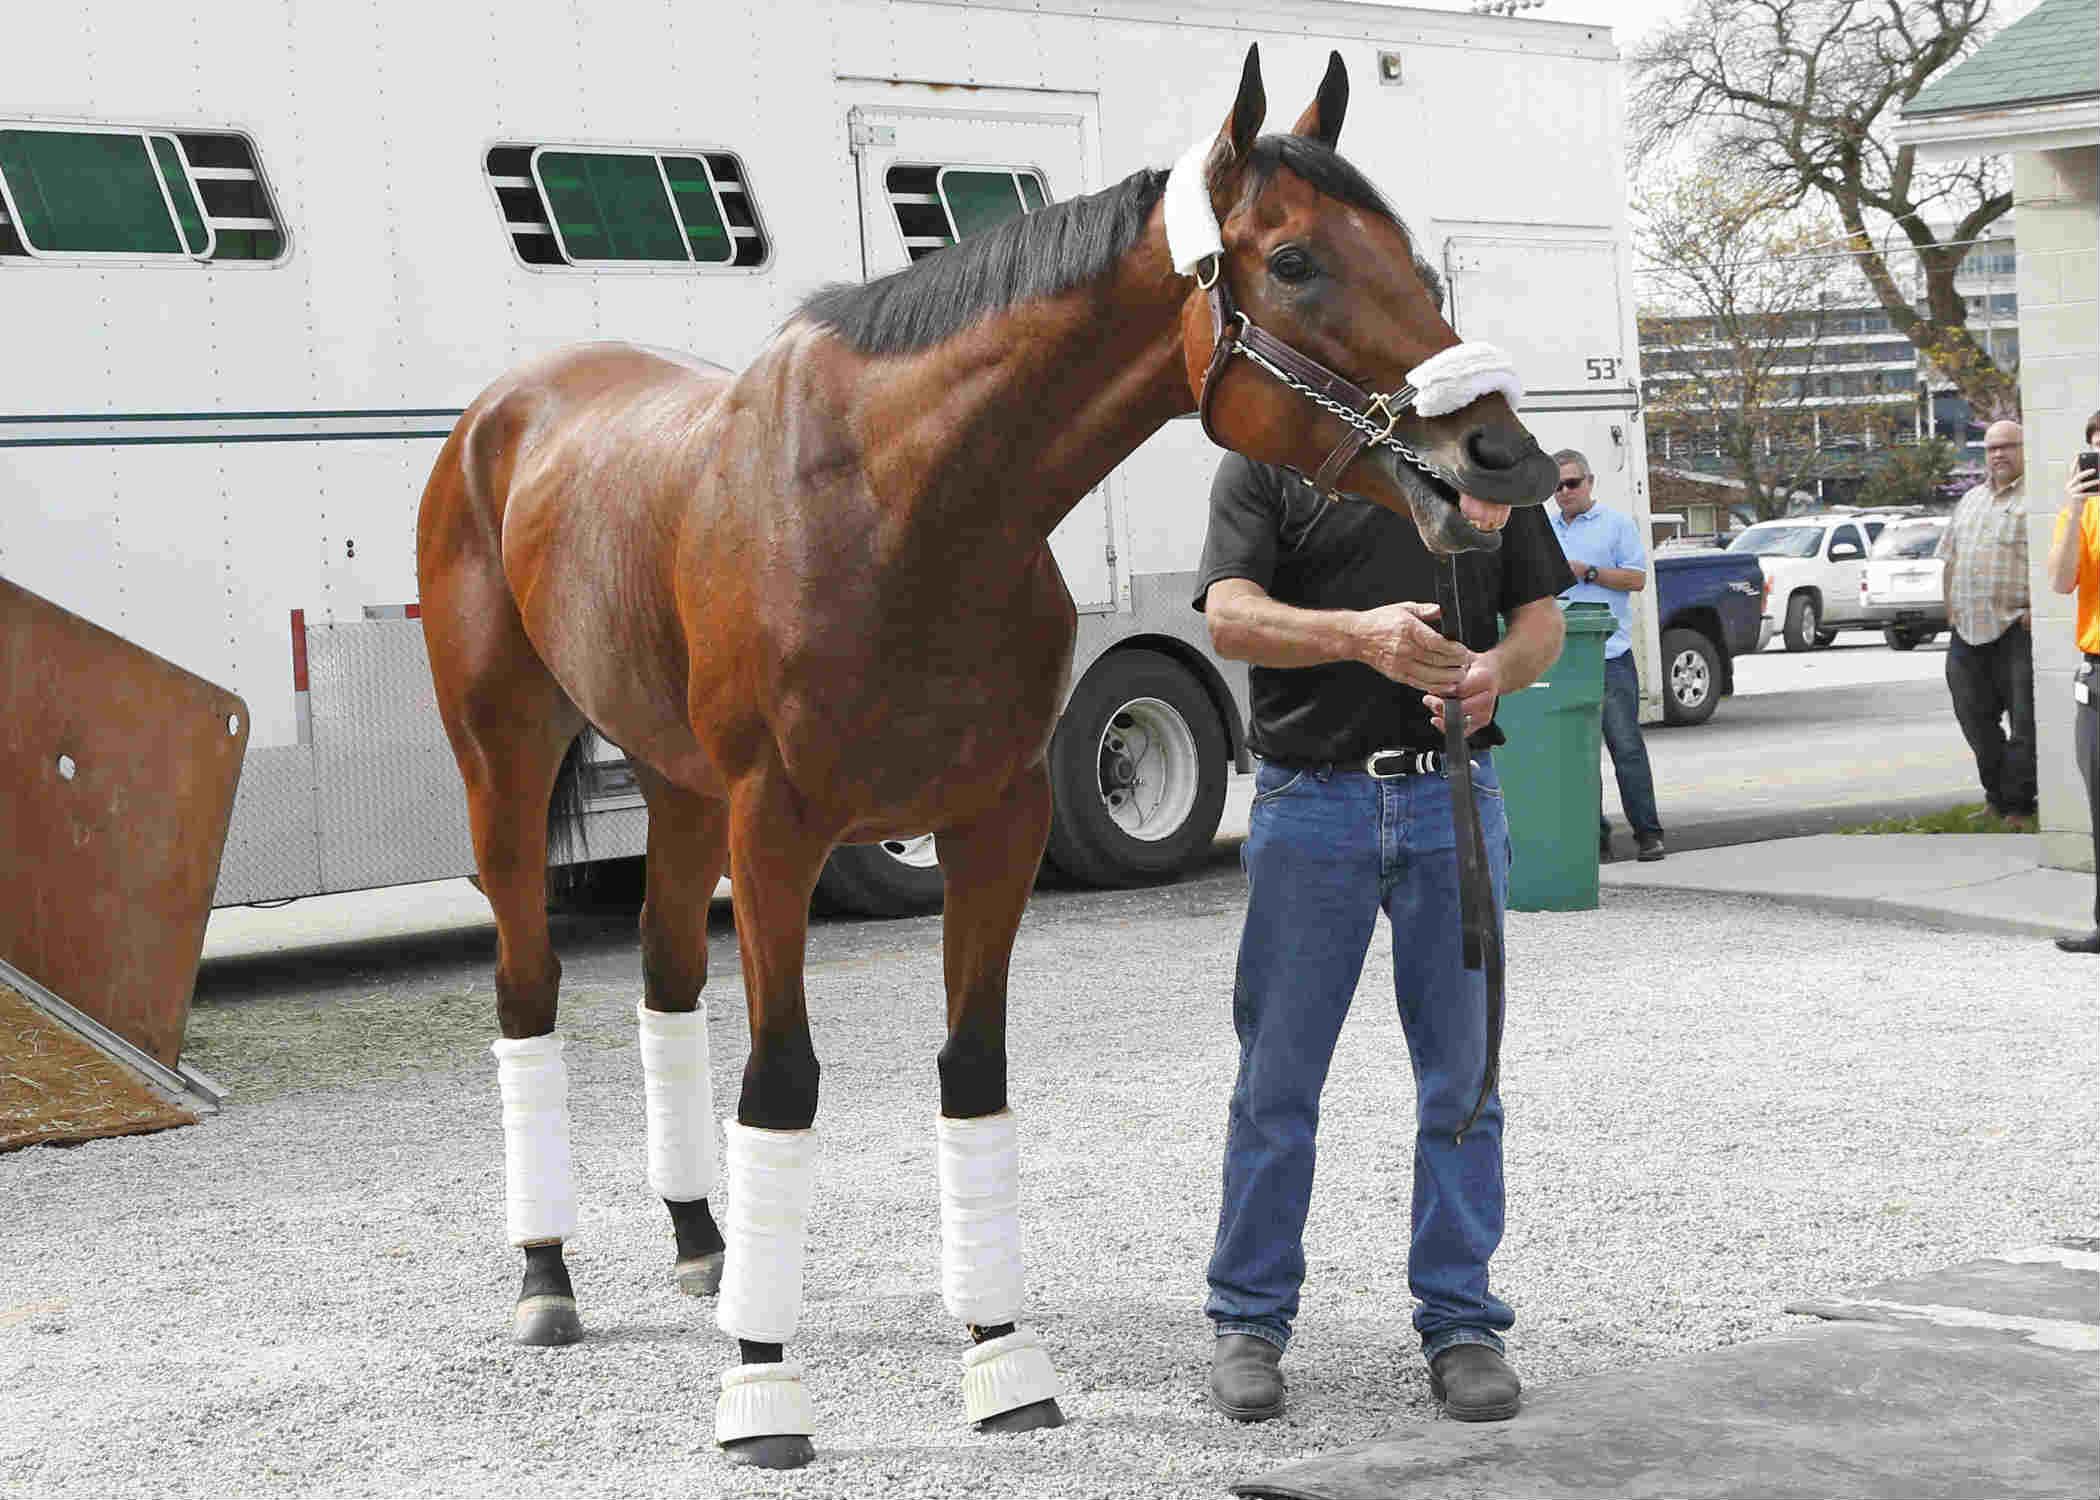 American Pharoah 1-5 Favorite in 10-Horse Field for Travers ...